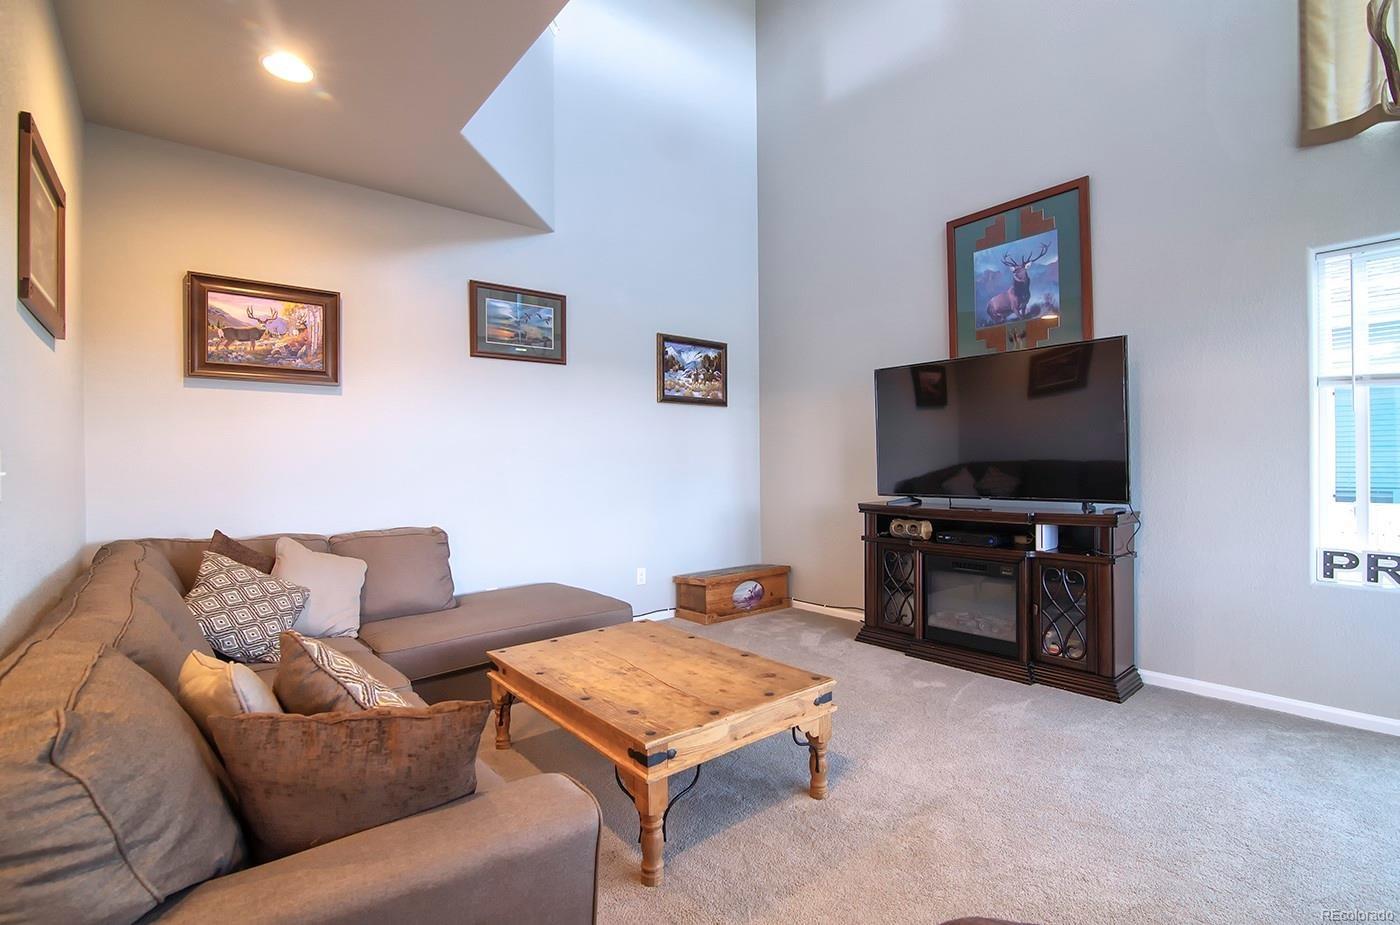 MLS# 7058019 - 6 - 9615 Rubicon Drive, Colorado Springs, CO 80925